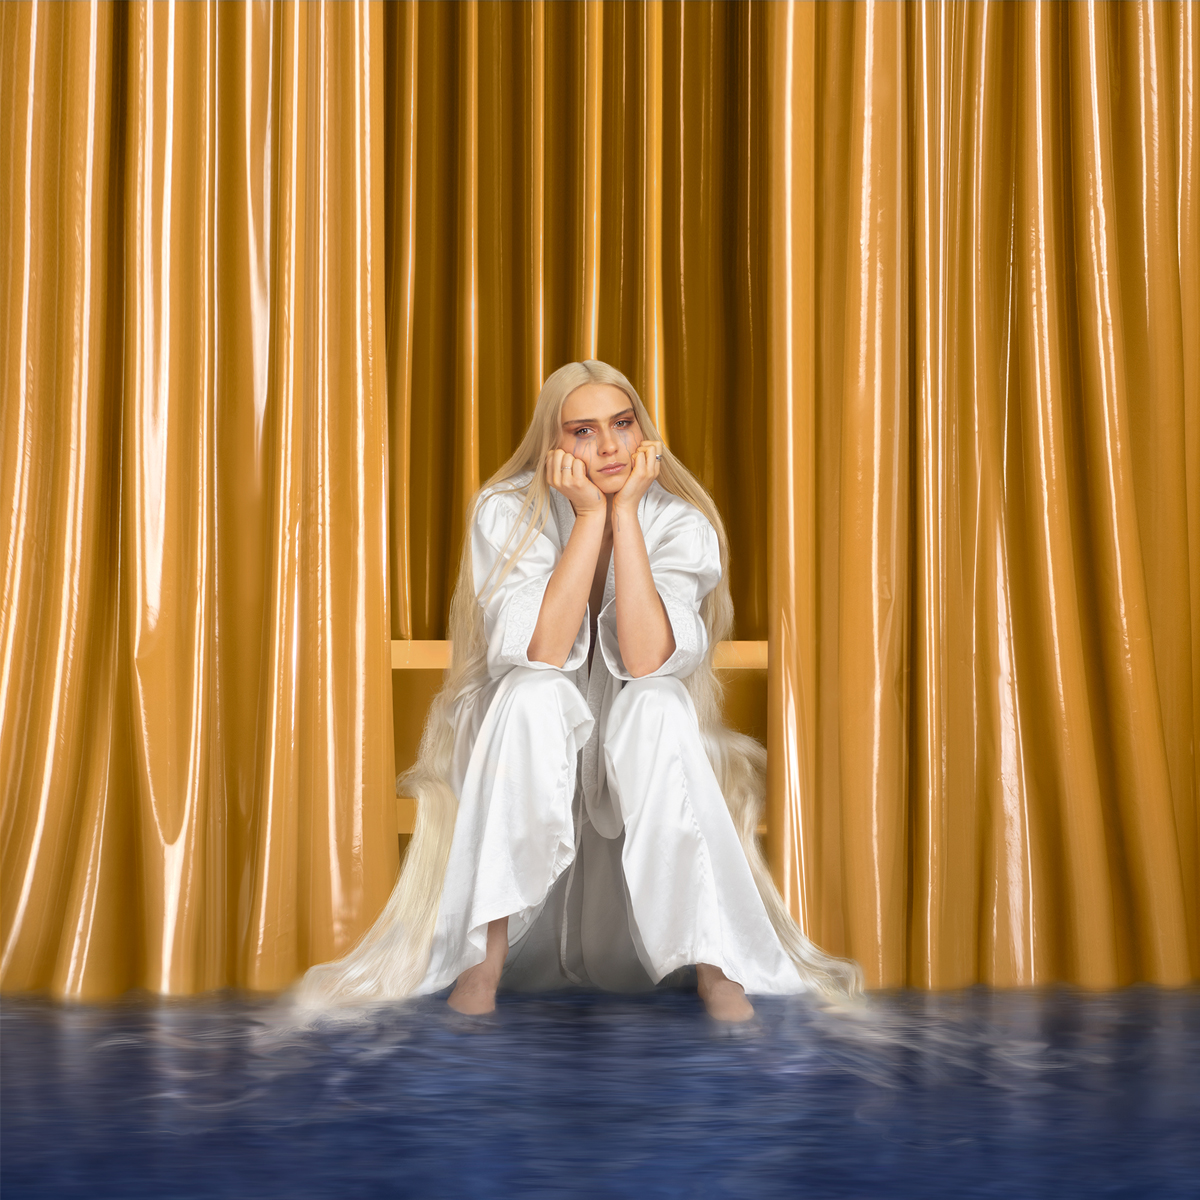 Banoffee 2021 album Teartracks